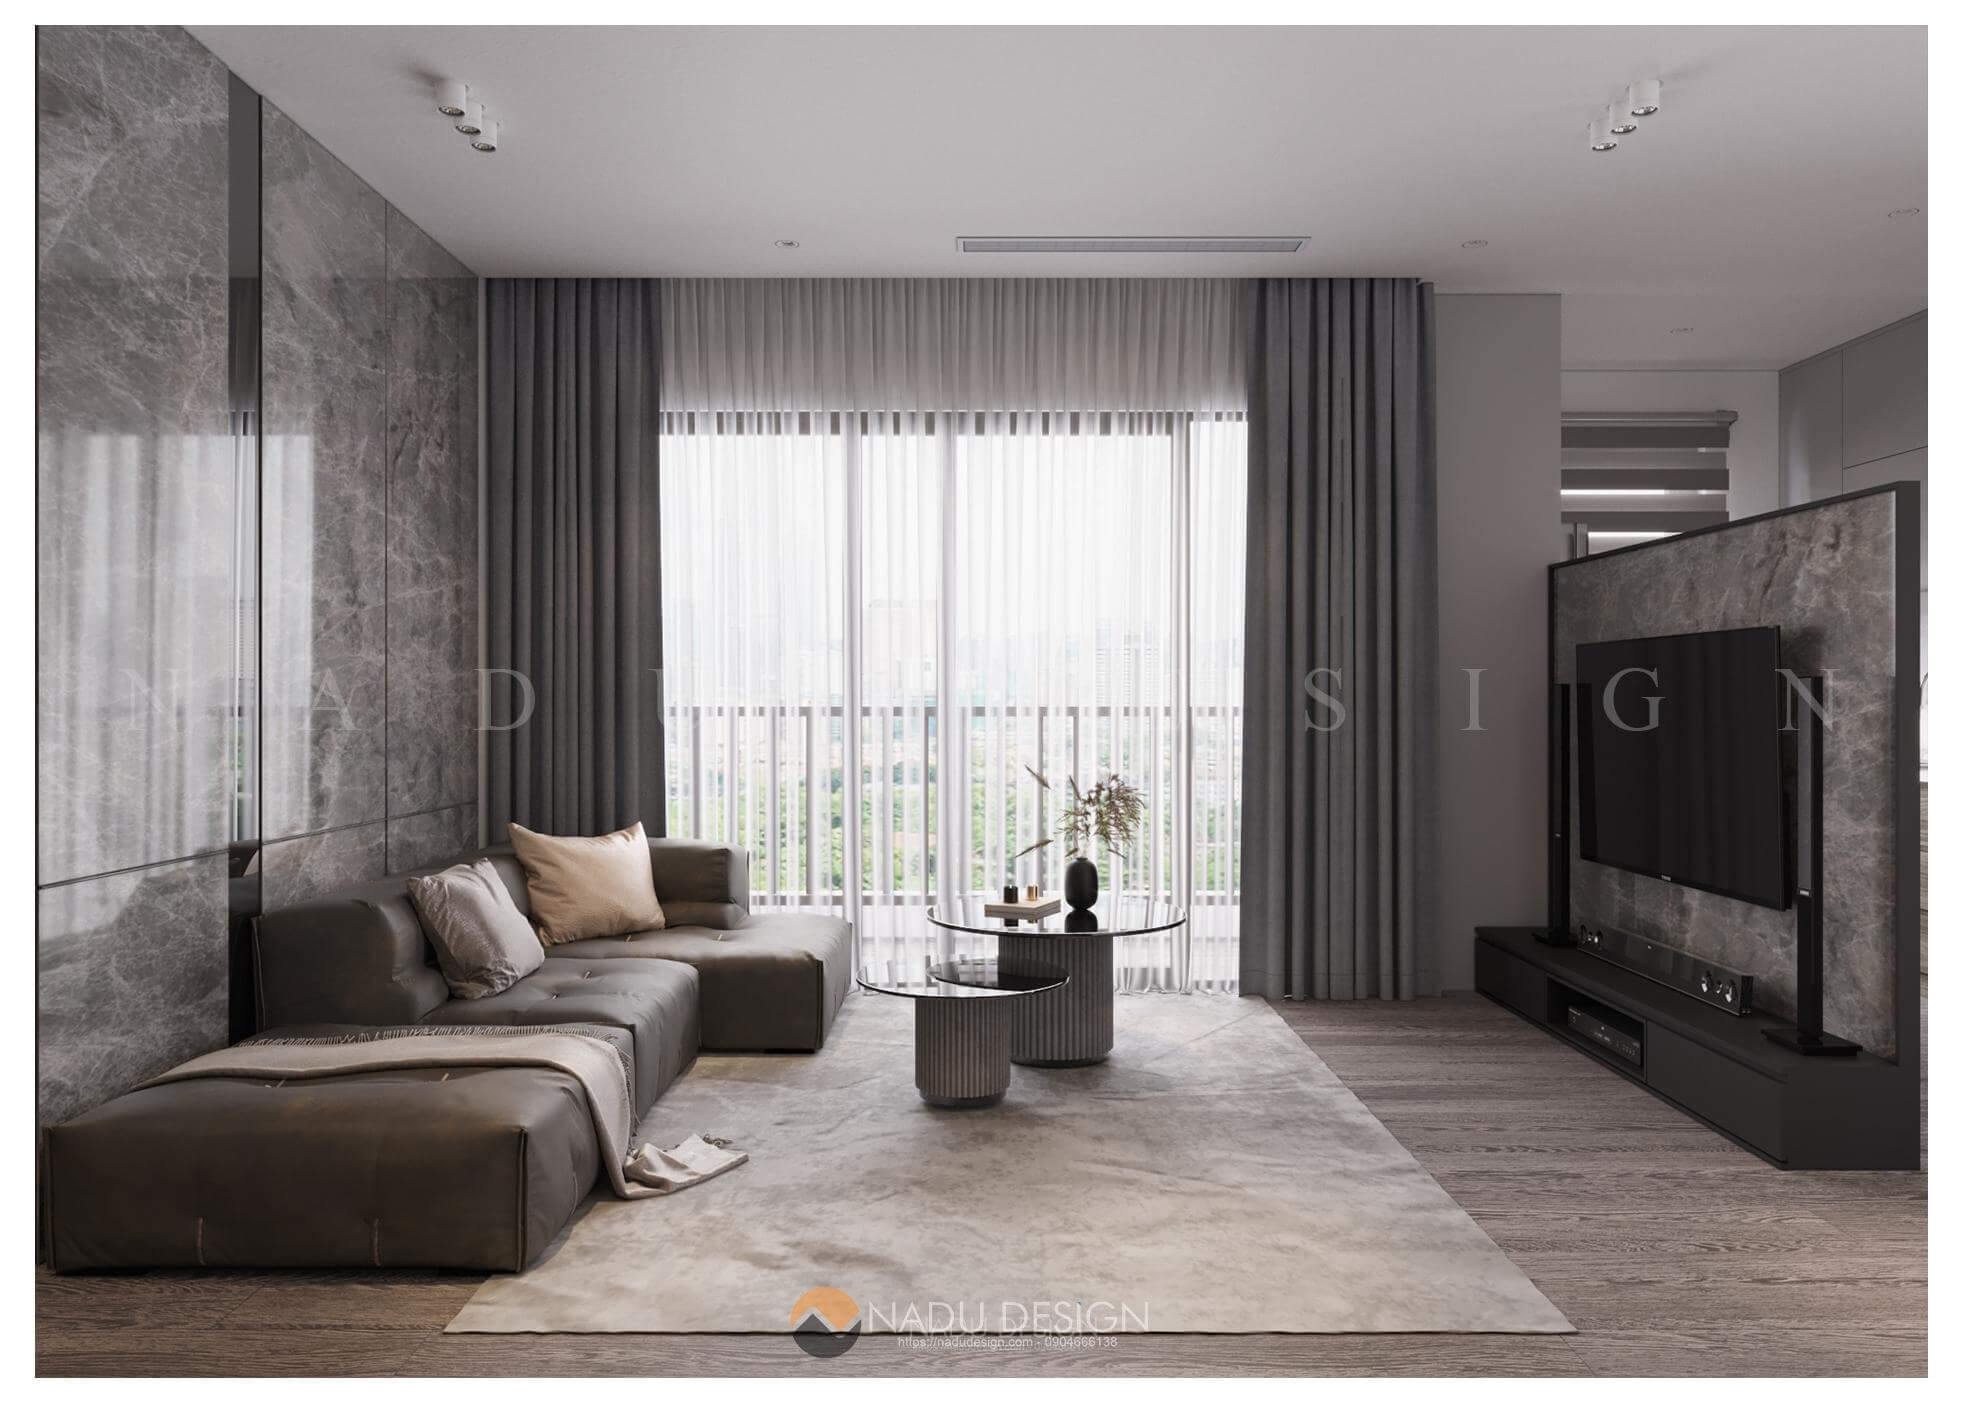 Thiết kế căn hộ Vinhomes Ocean Park - Vinhomes Smart City